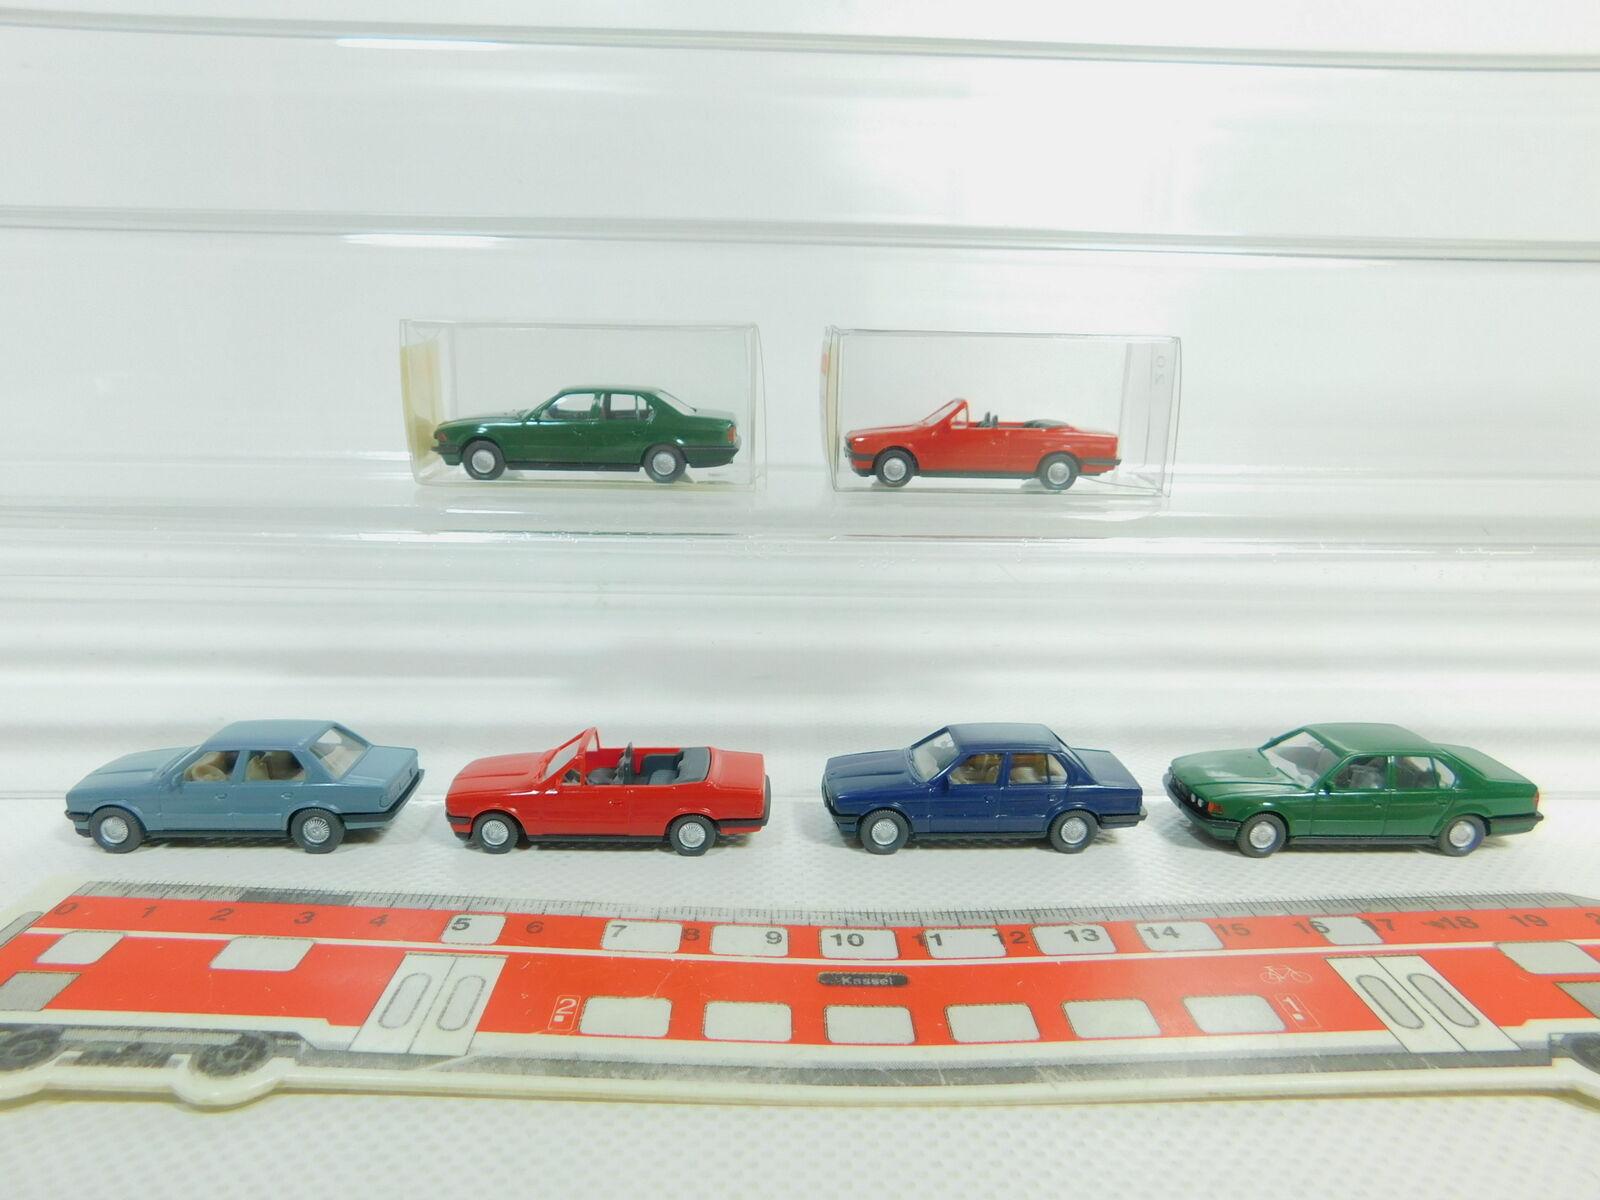 Bo612-0, 5  6x Wiking h0 1 87 voiture BMW  192 750i  191 320i cabriolet etc Neuw 2x neuf dans sa boîte